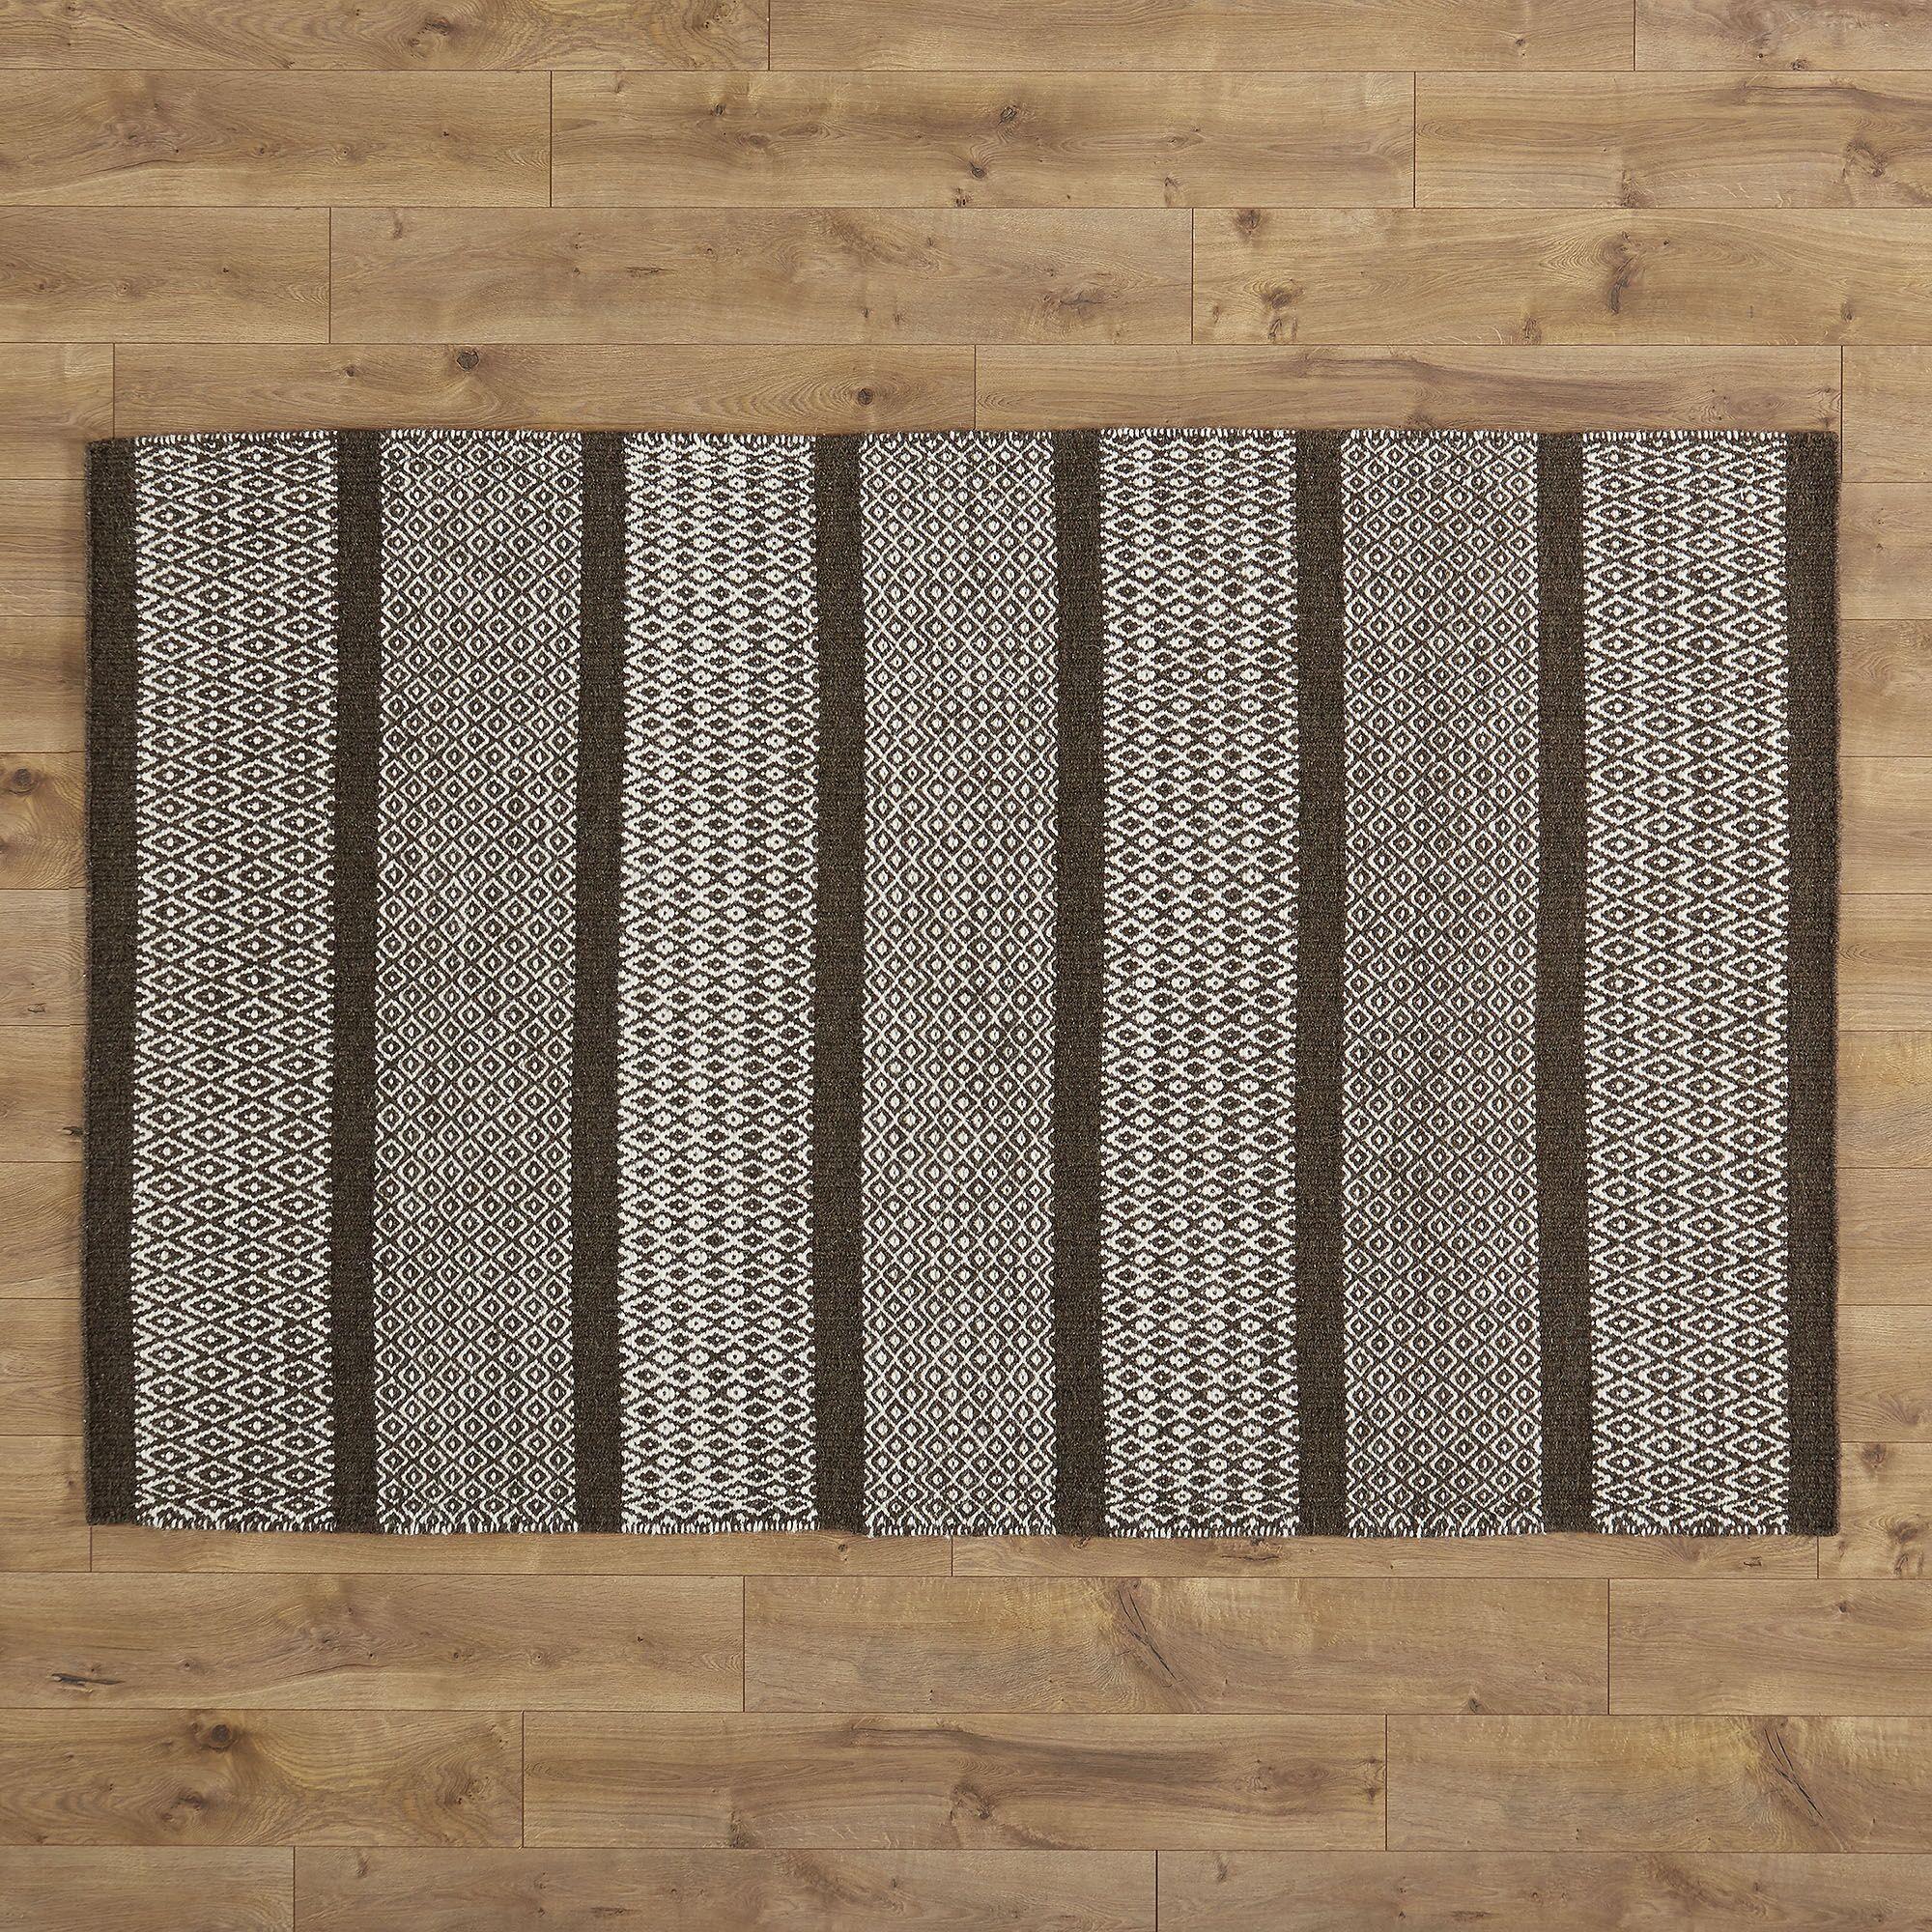 Willard Hand-Woven Chocolate Area Rug Rug Size: Rectangle 9' x 12'